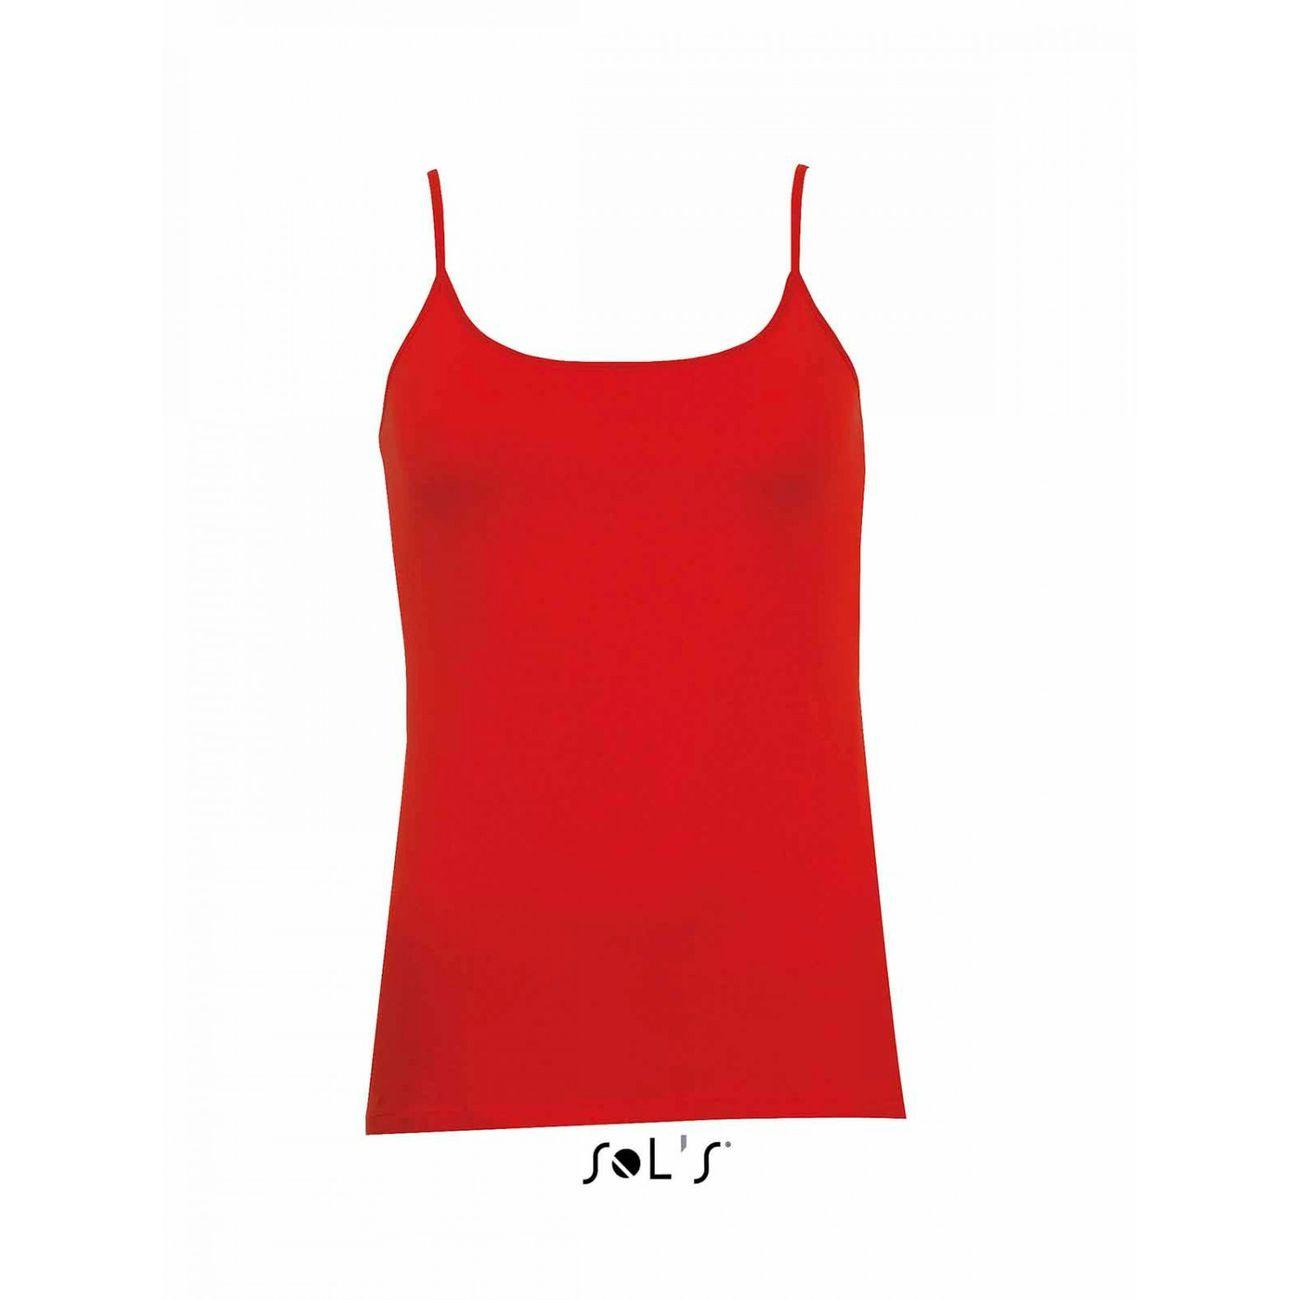 DbardeurFines Bretelles01184 Femme Coquelicot Sol S ModeLifestyle Rouge Yb7ygvf6